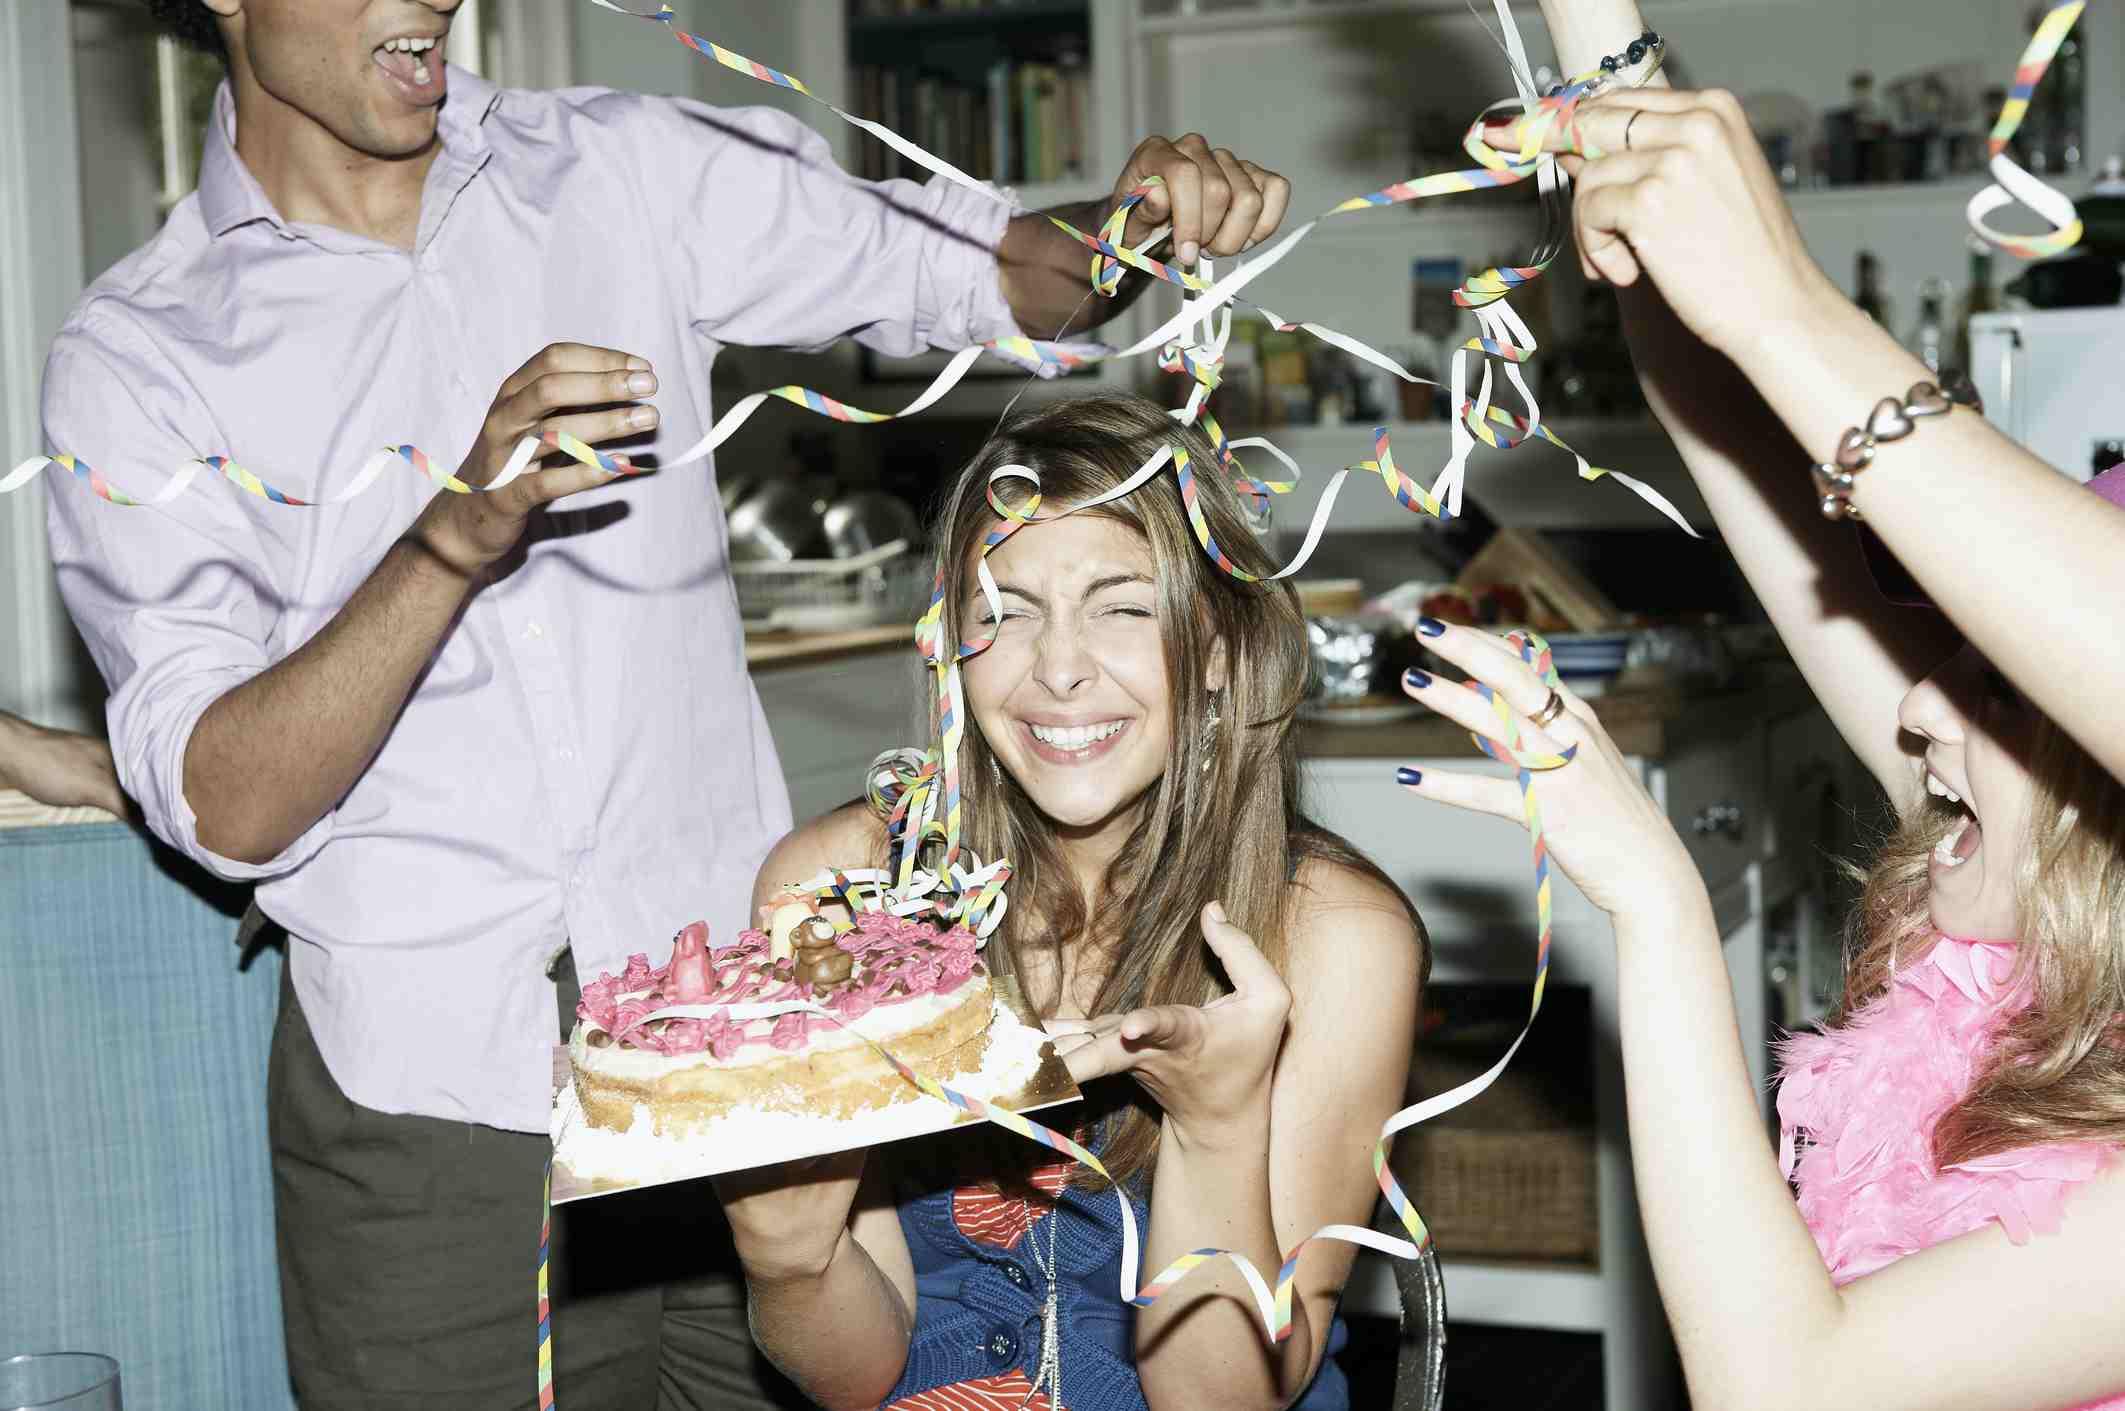 Friends releasing birthday streamers on birthday girl